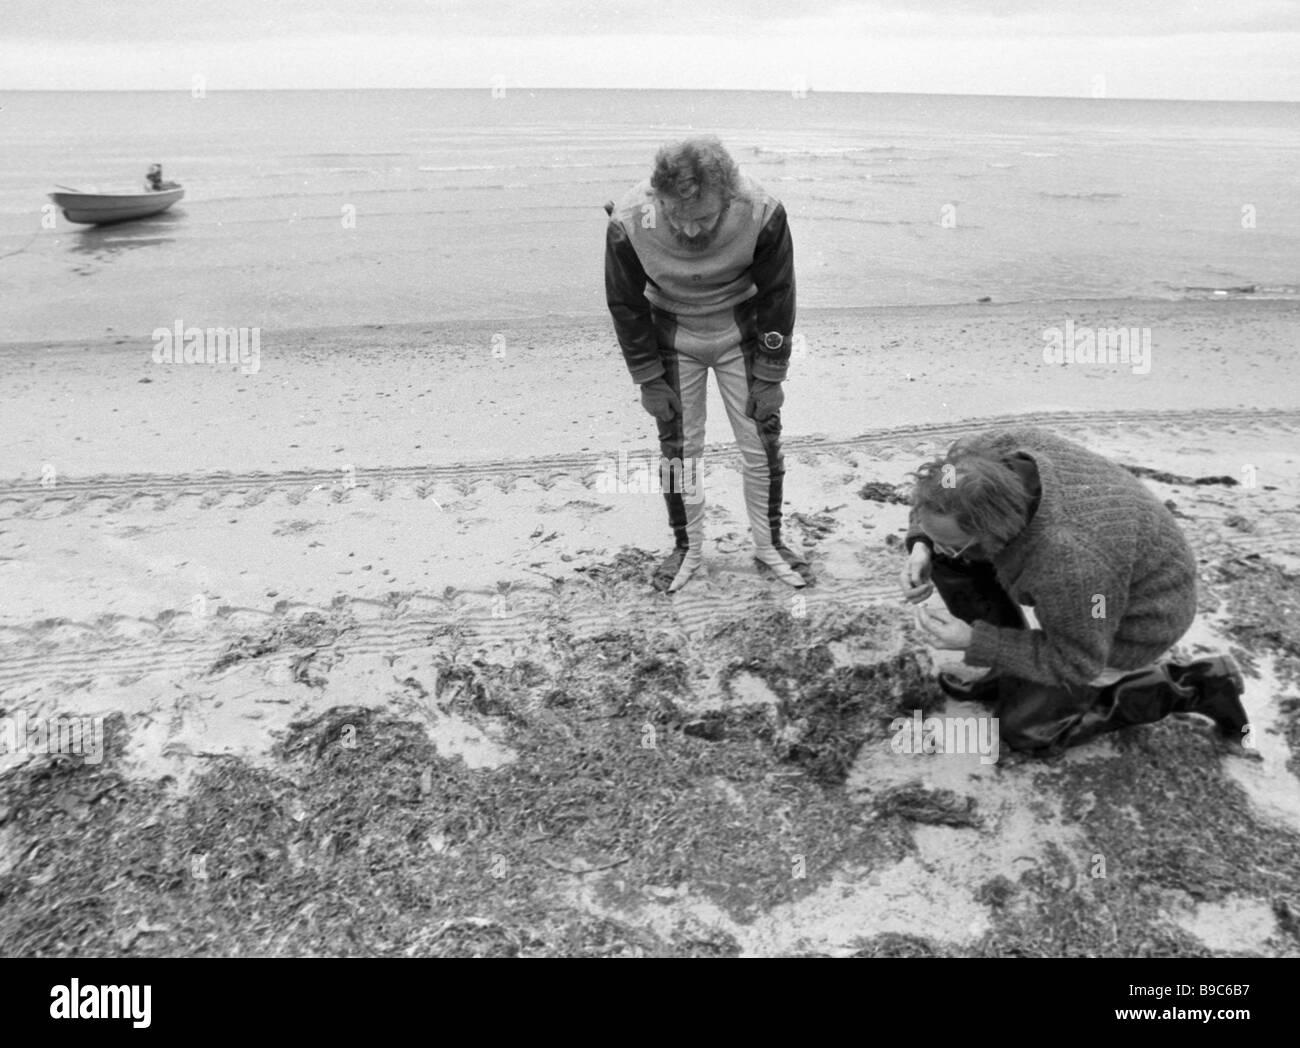 Staff of Leningrad Institute of Zoology of the Soviet Academy of Sciences examining the White Sea coastline - Stock Image